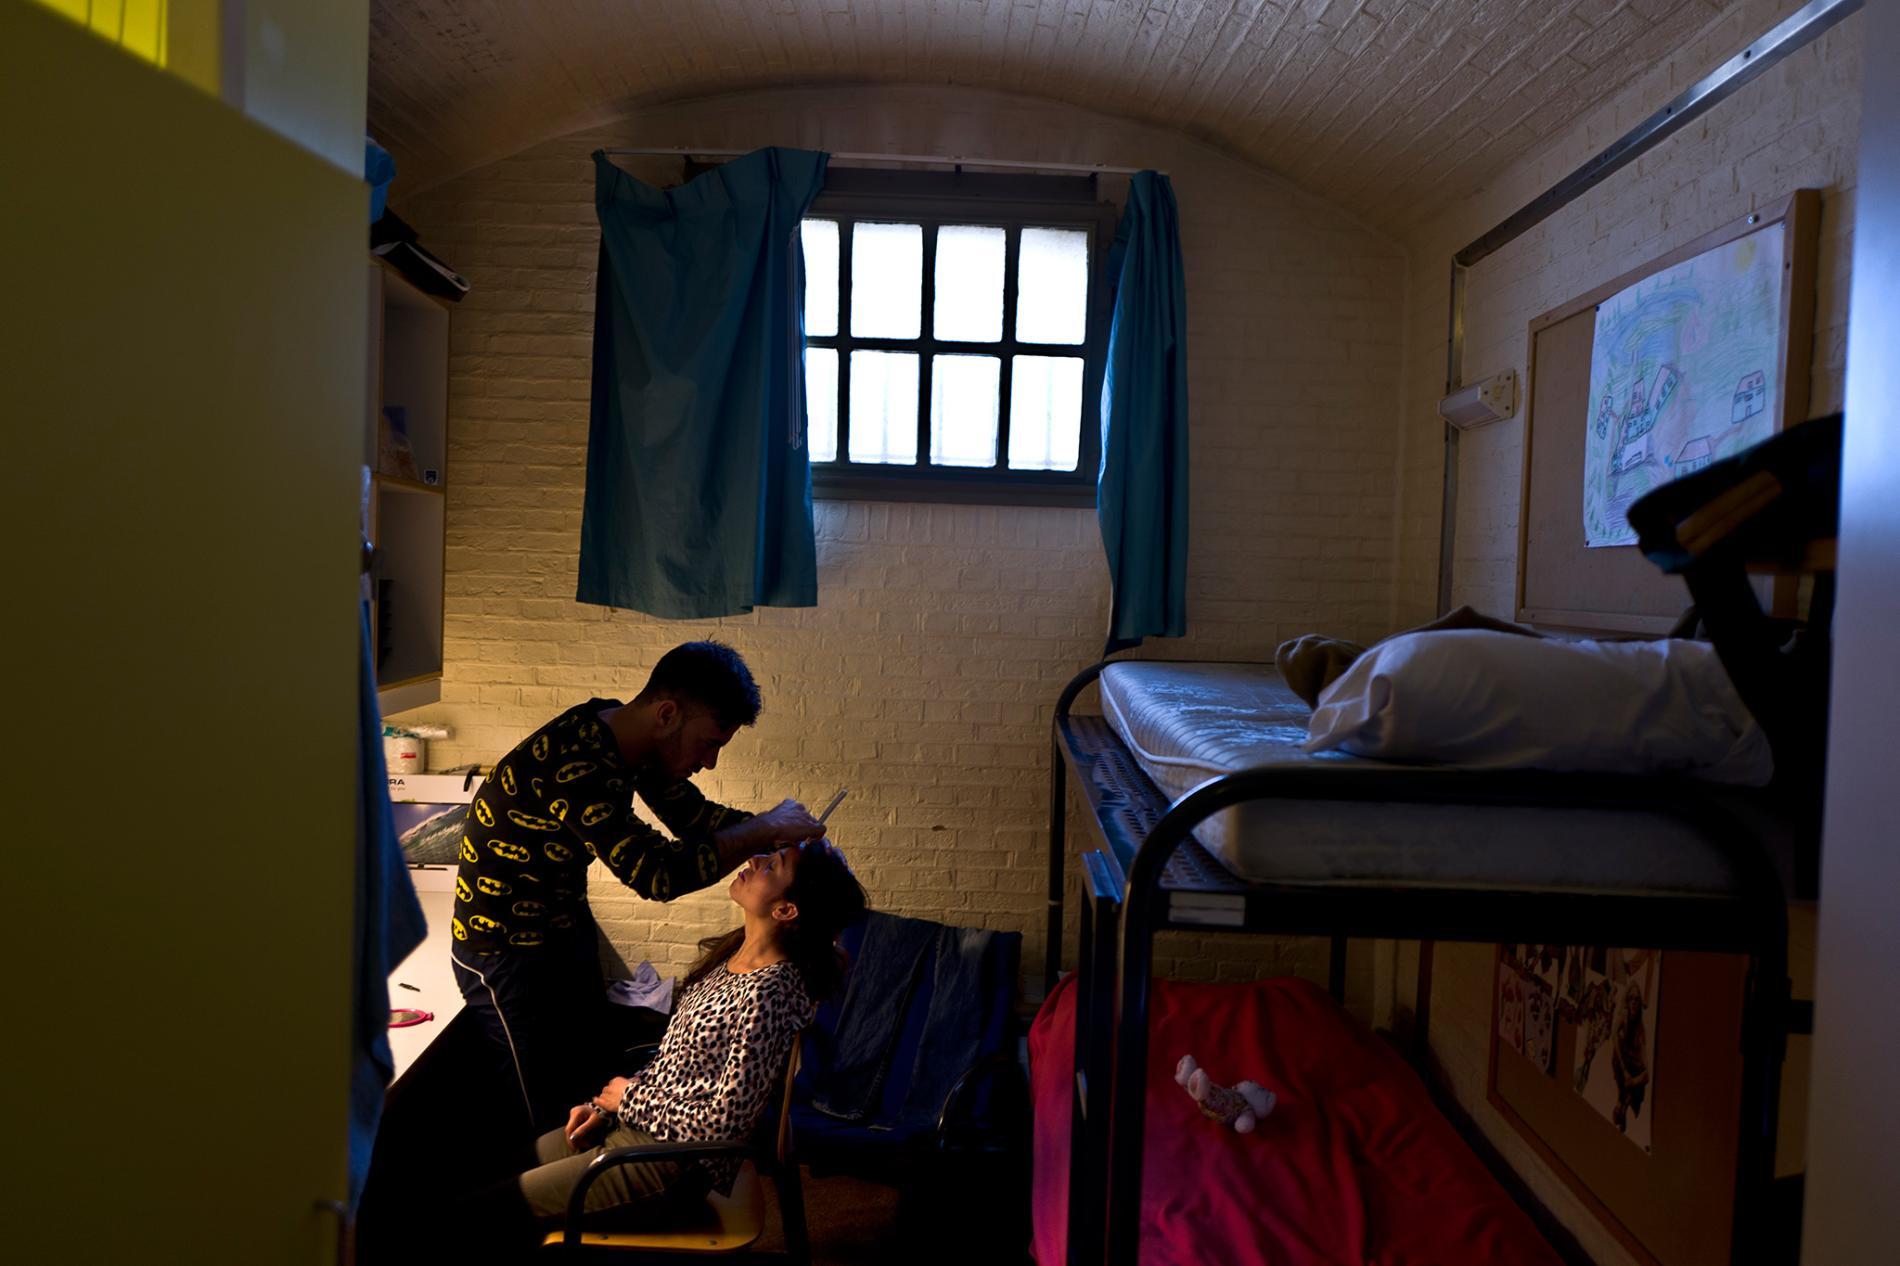 03-cells-asylum-refugees.adapt.1900.1